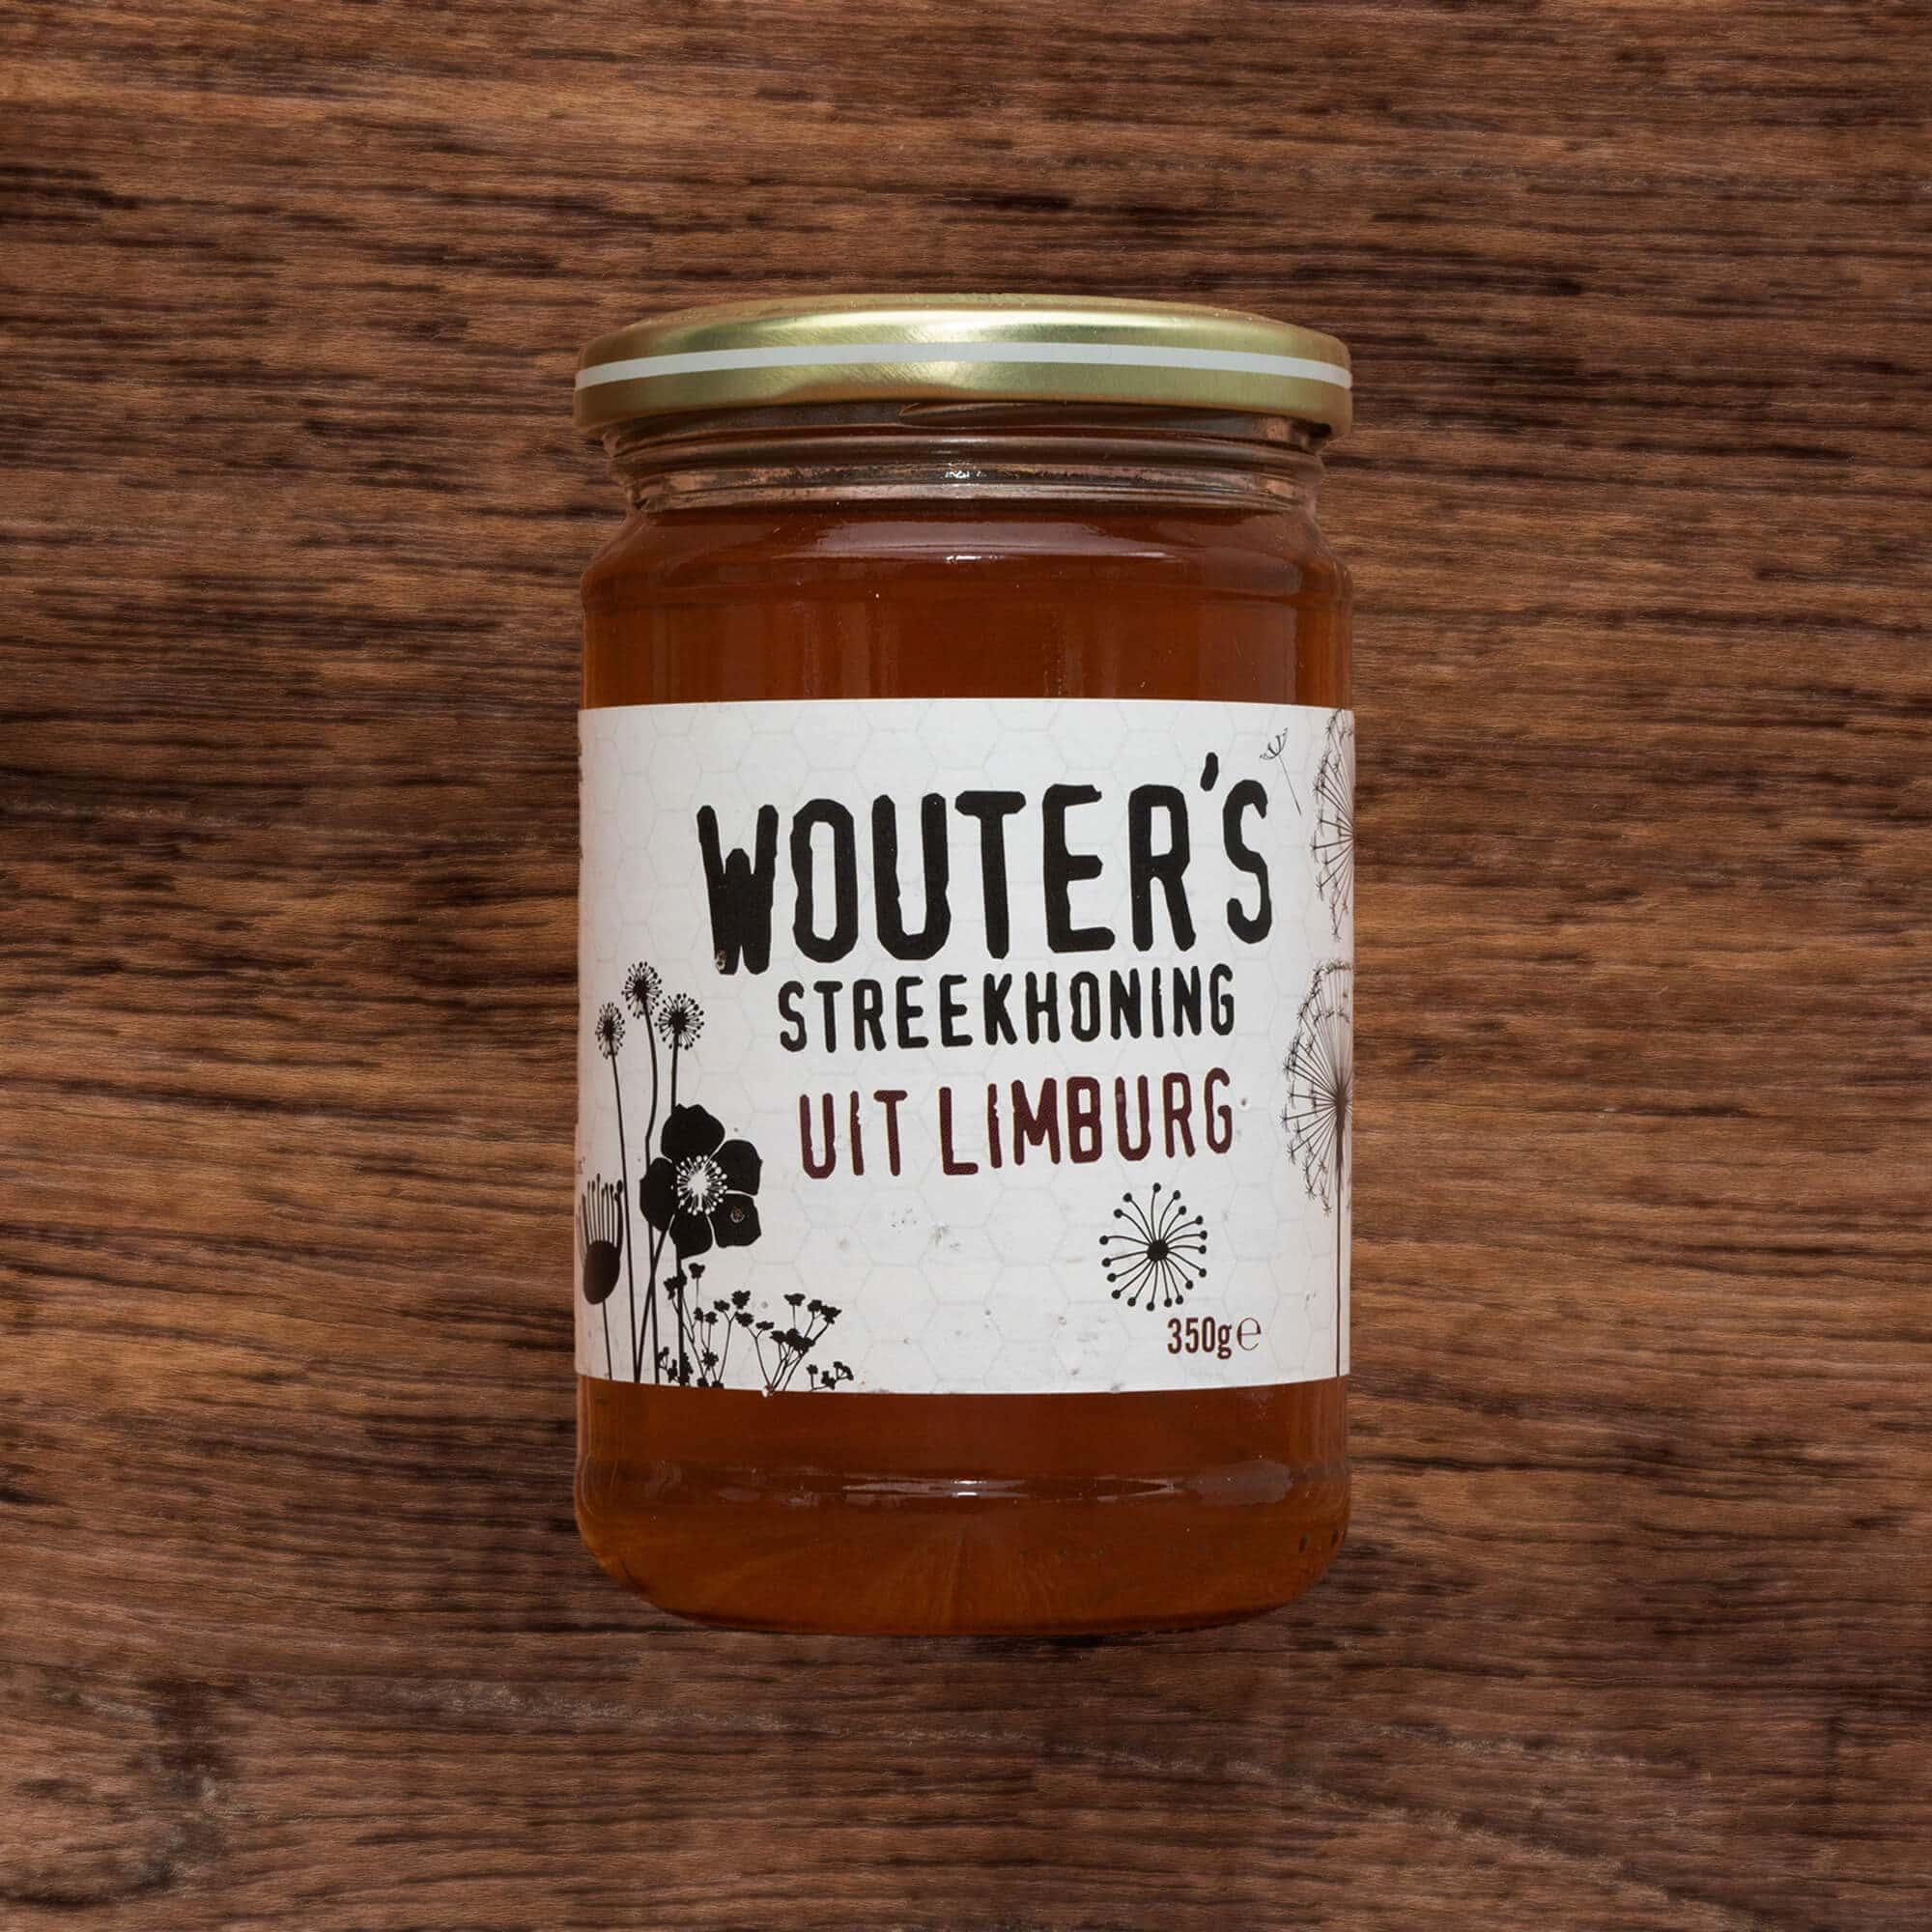 Wouter's streekhoning uit Limburg